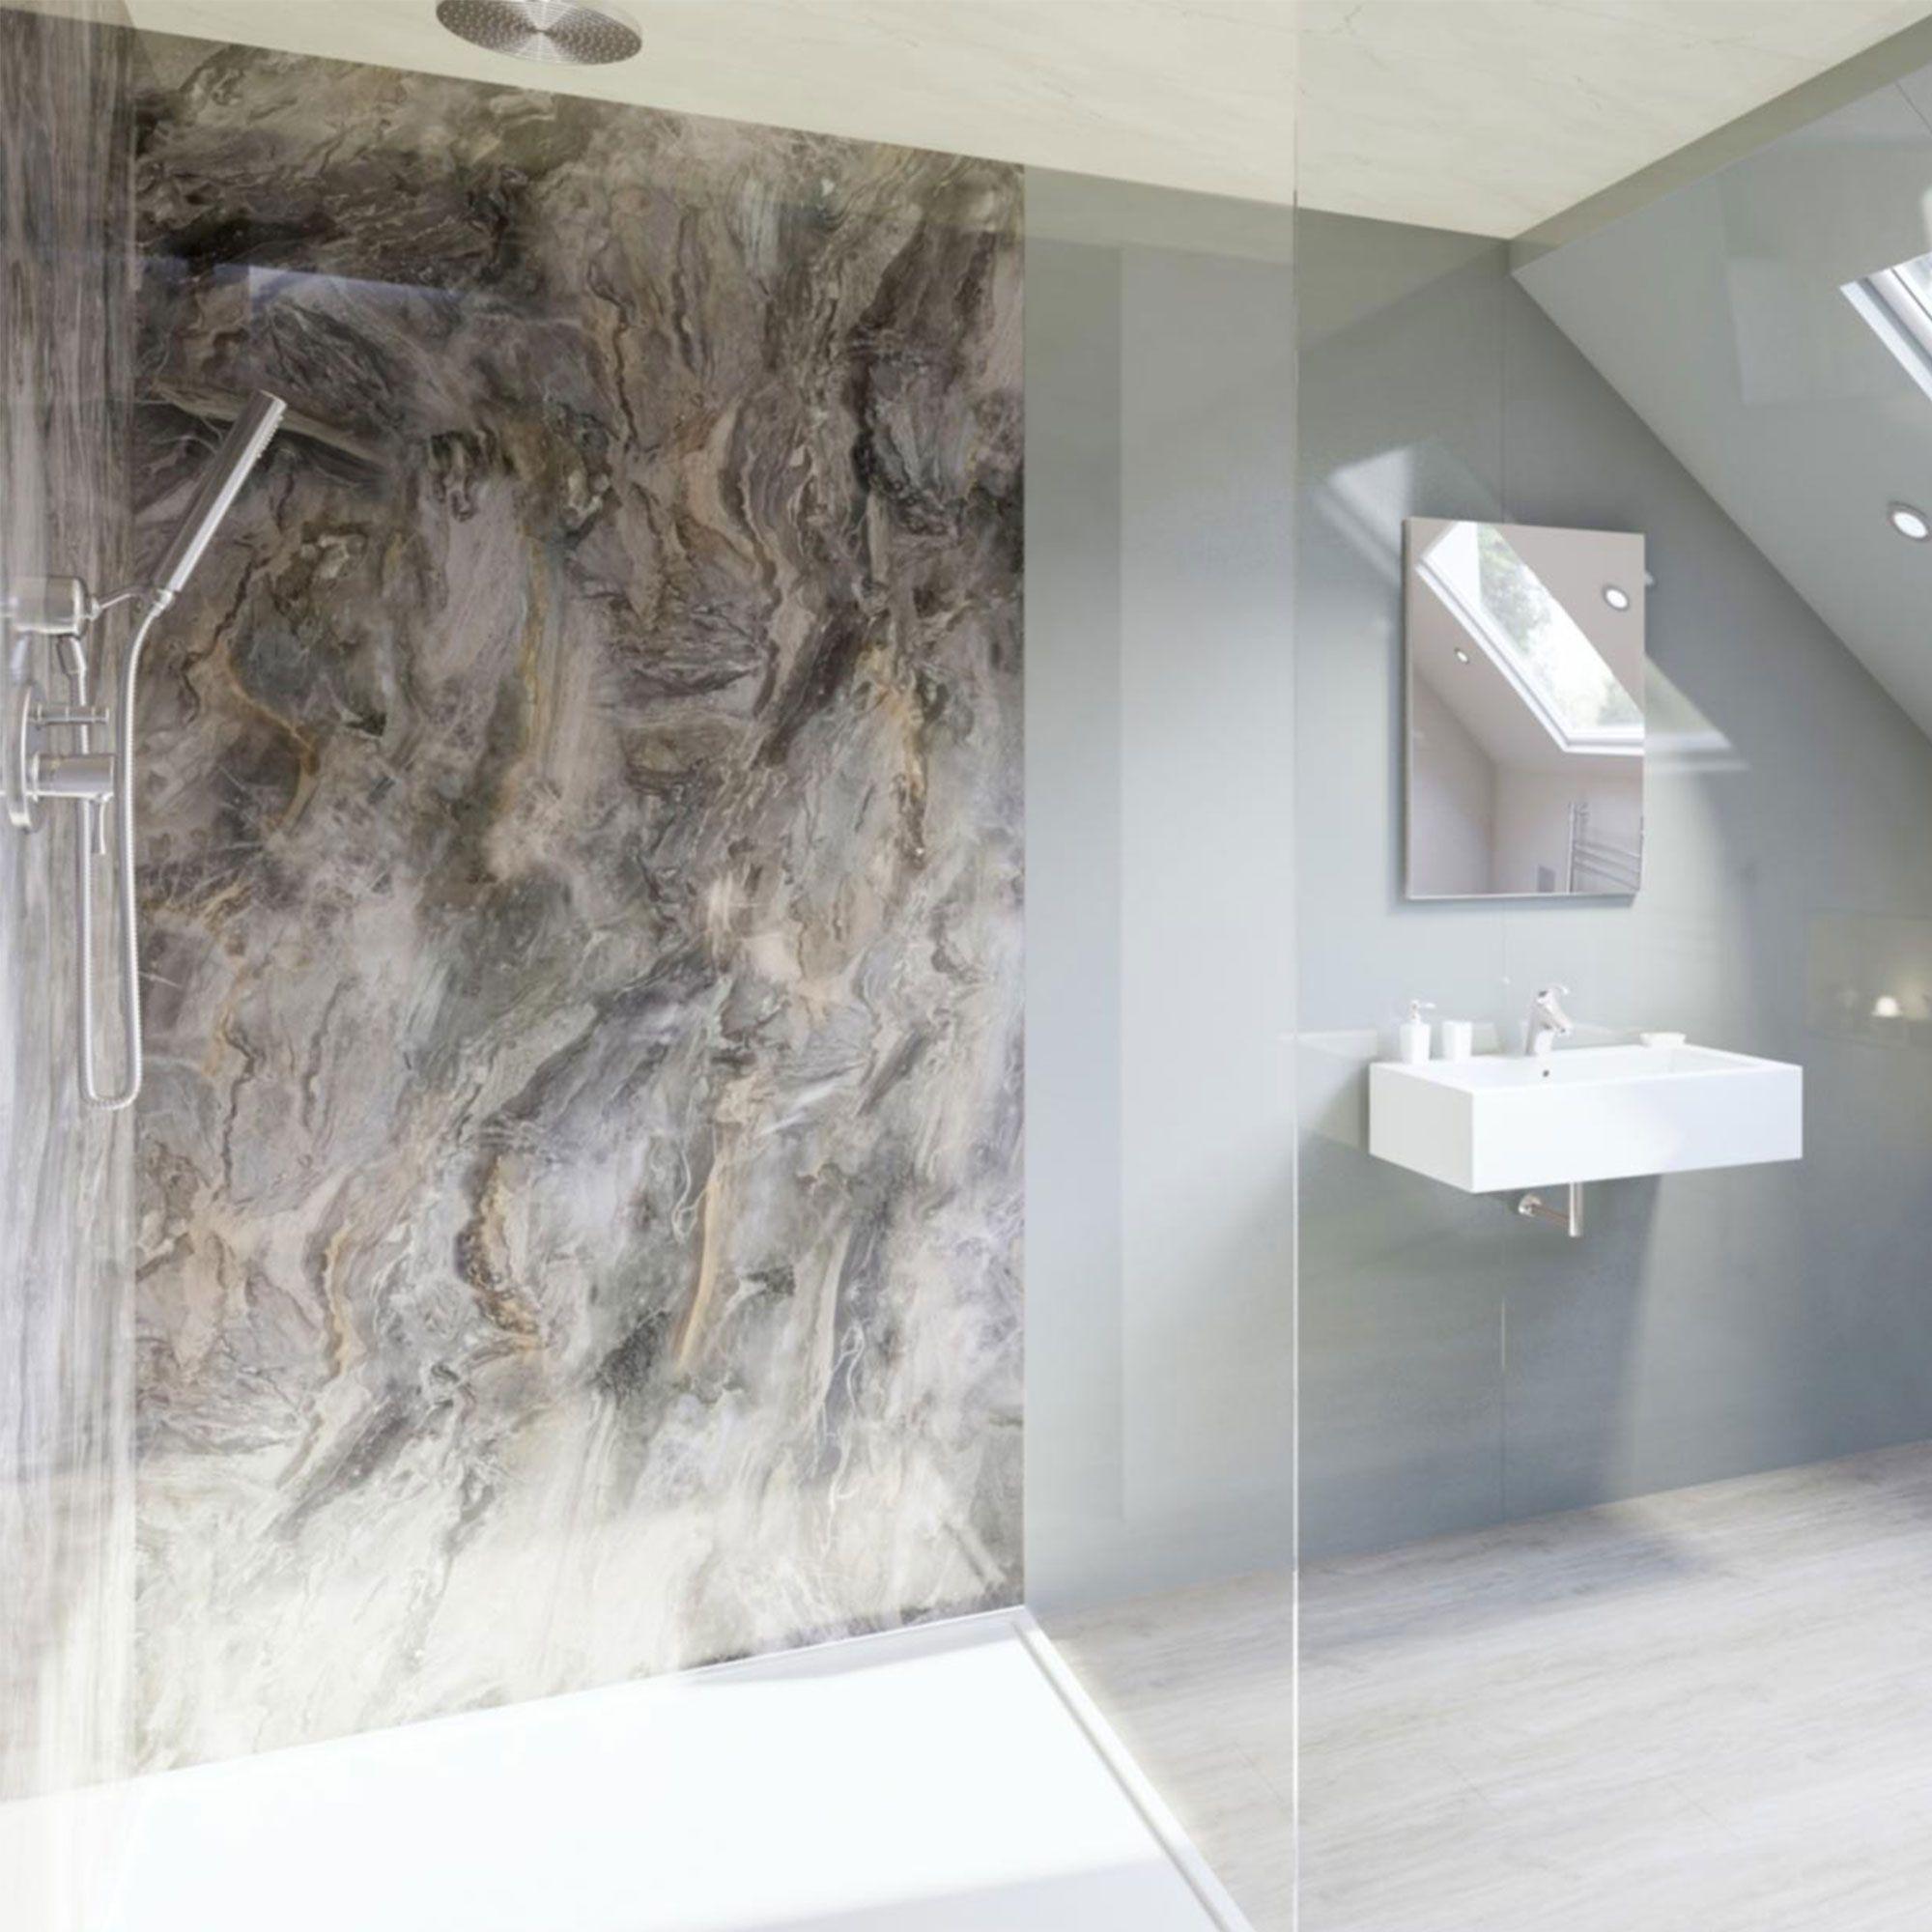 Multipanel Classic Cappuccino Stone Hydro Lock Tongue Groove Bathroom Wall Panel Bathroom Wall Panels Bathroom Shower Walls Alternative To Bathroom Tiles